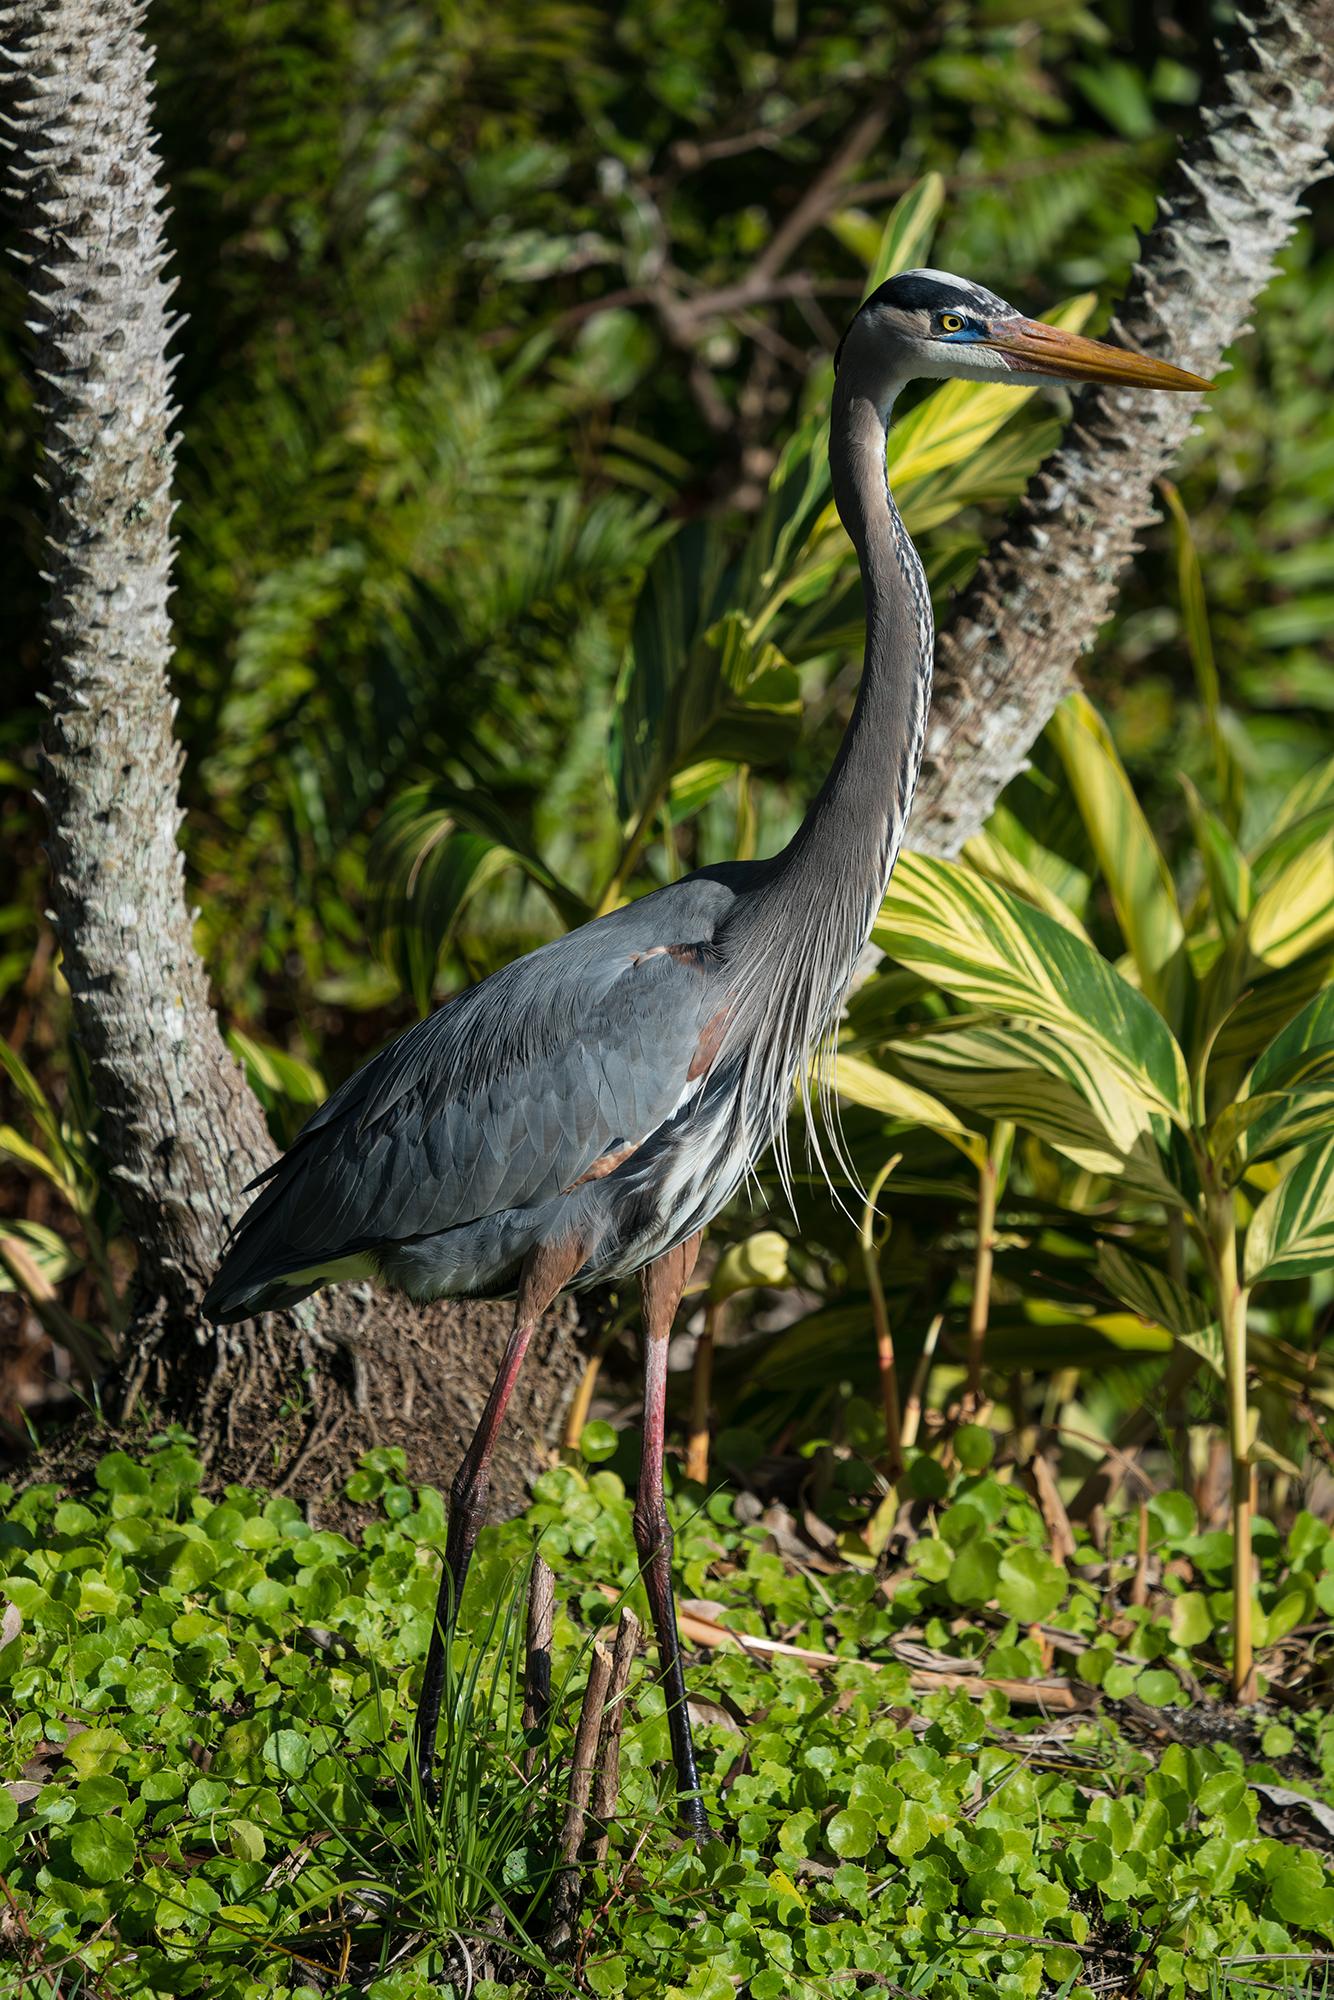 #heron, #blueheron, #greatblueheron, #eye, #breedingplumage, #standing, #wildlife, #birds, #florida